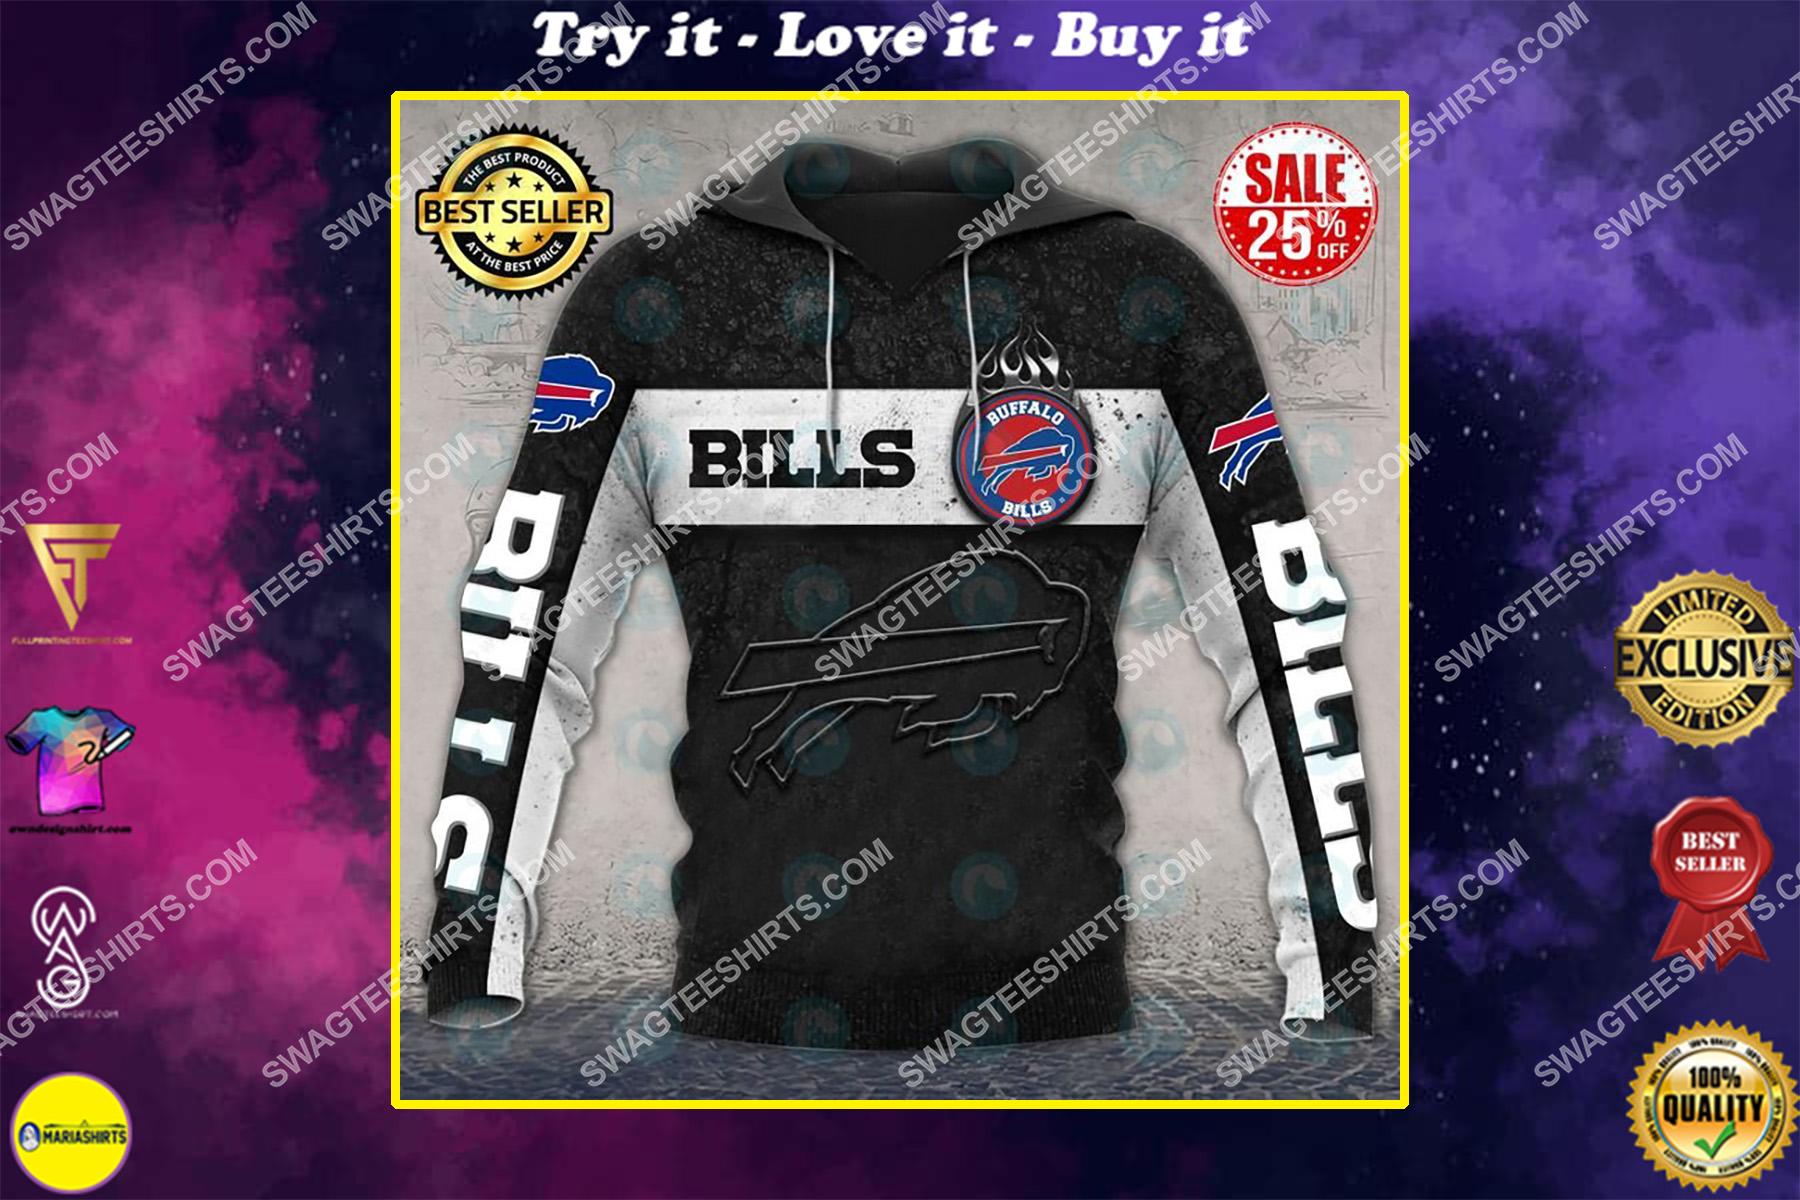 the buffalo bills football team all over printed shirt